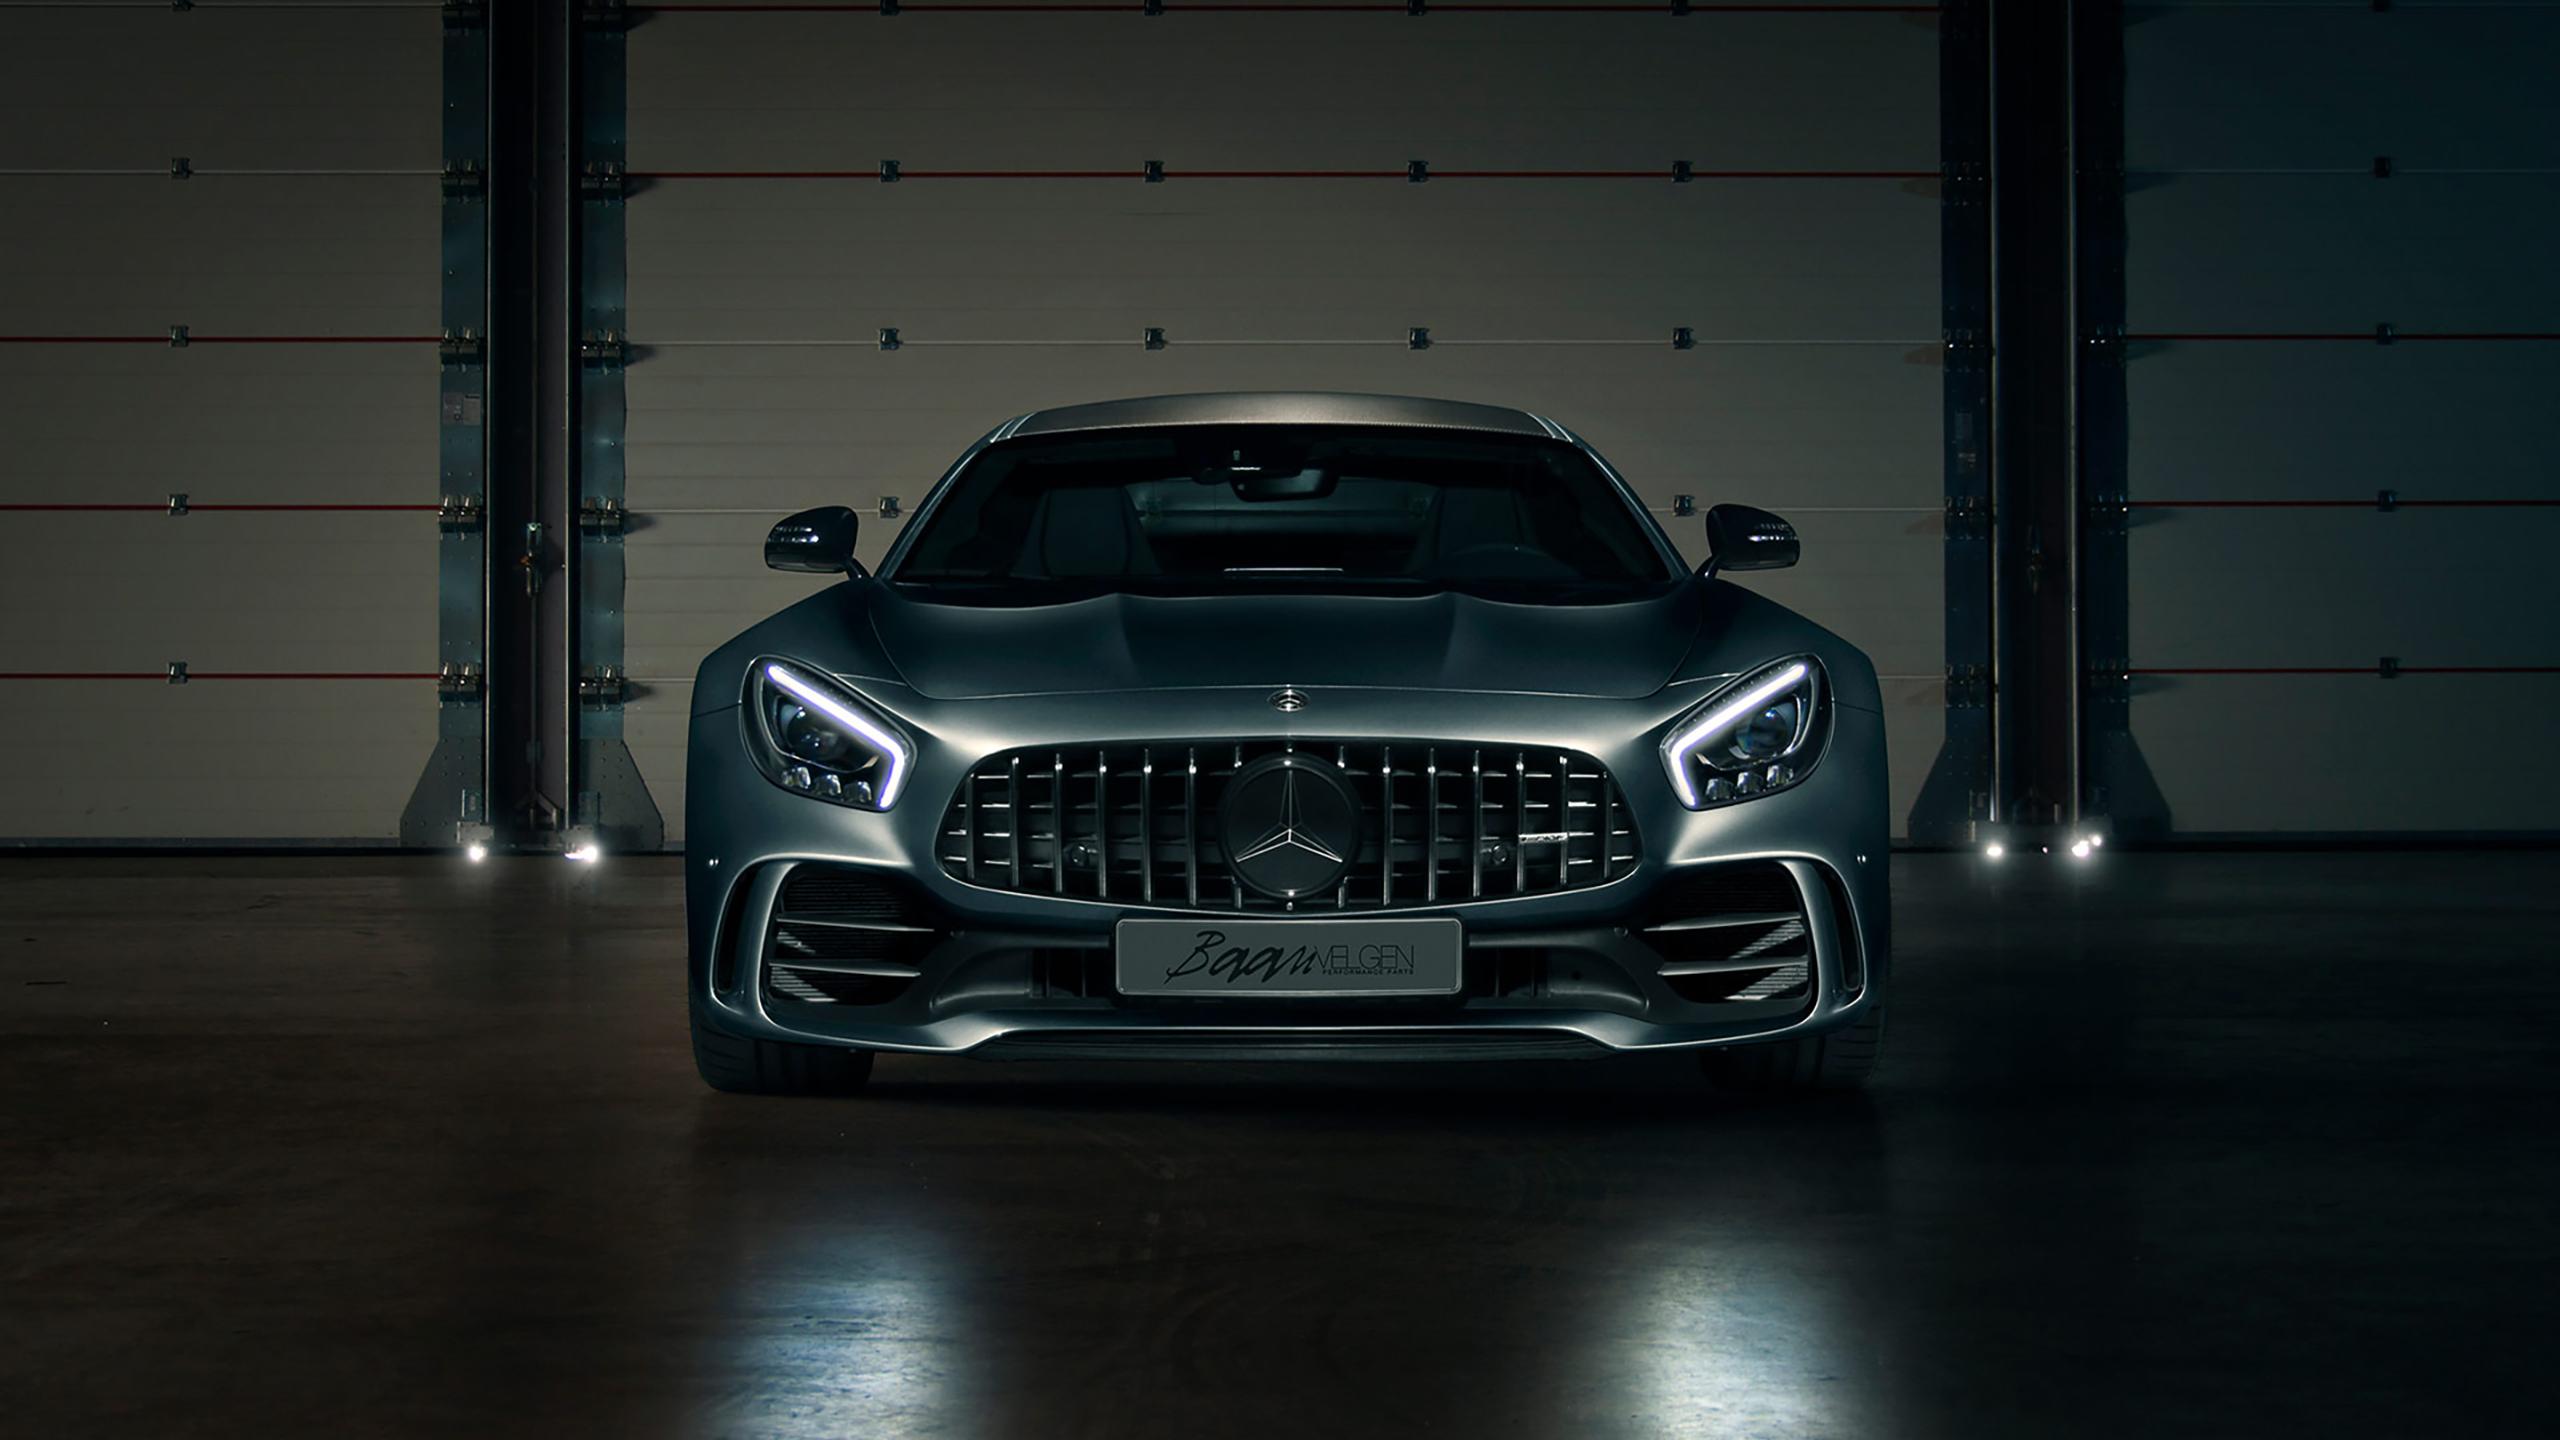 Black Mercedes Benz Amg GT HD, HD Cars, 4k Wallpapers ...